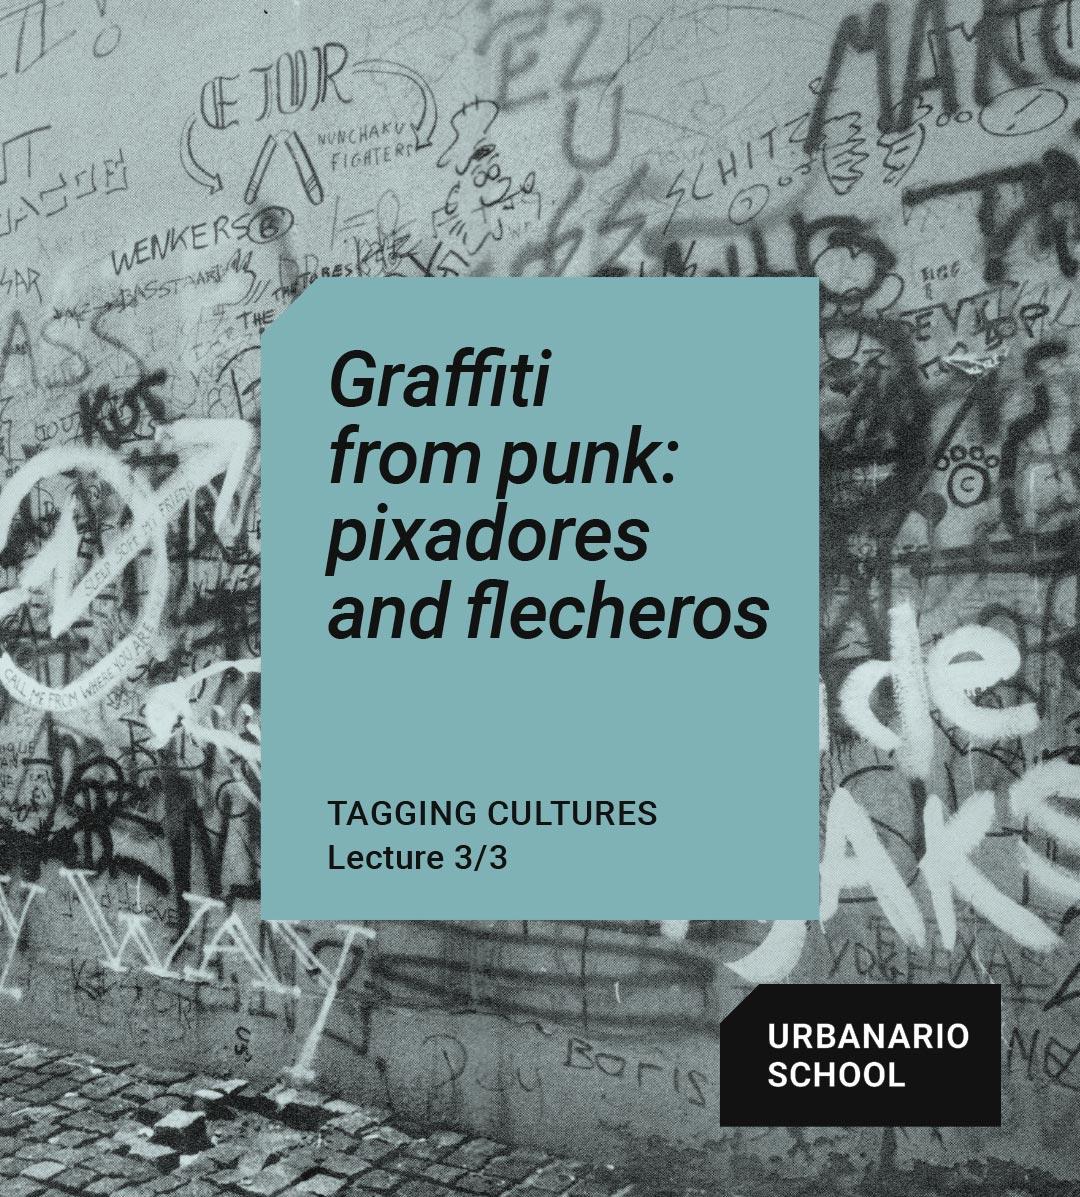 Graffiti from punk - Urbanario School